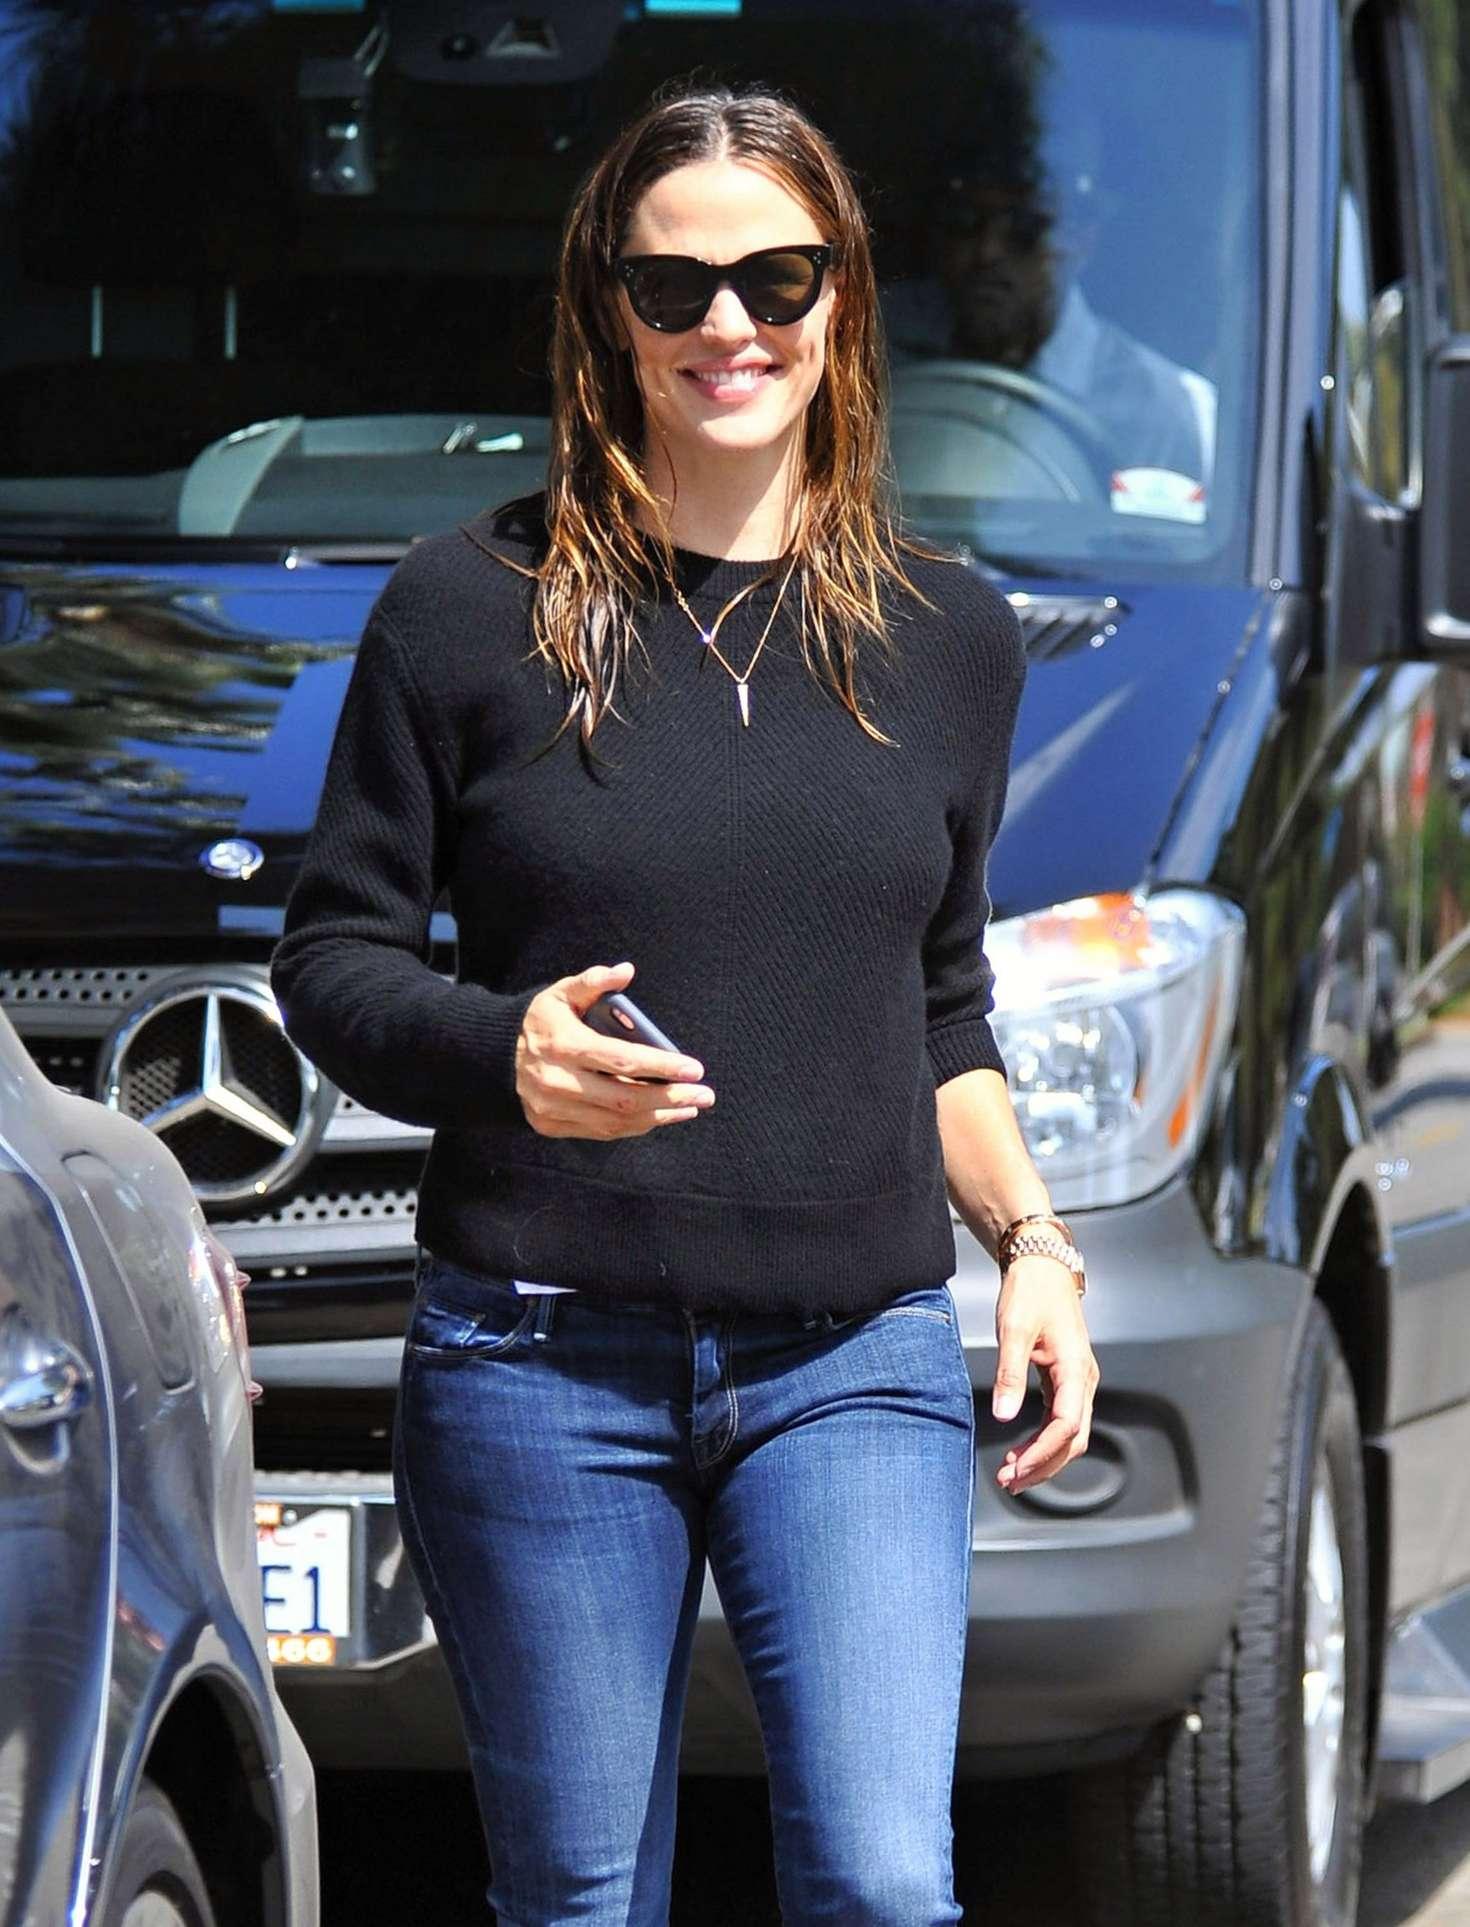 Jennifer Garner 2016 : Jennifer Garner Booty in Jeans -12